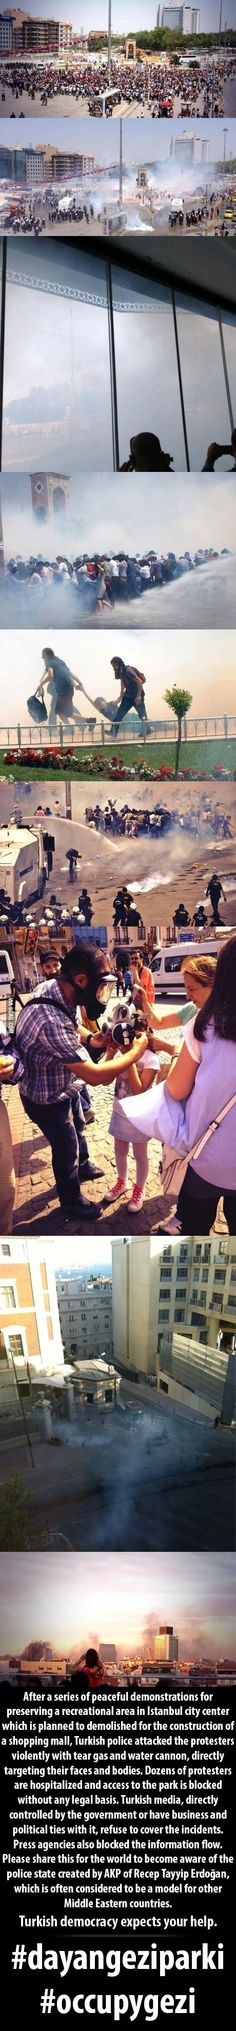 #occupygezi #direngeziparkı #direngezi #wearegezi #occupytaksim #occupyturkey #chapulling #Istanbul #Turkey